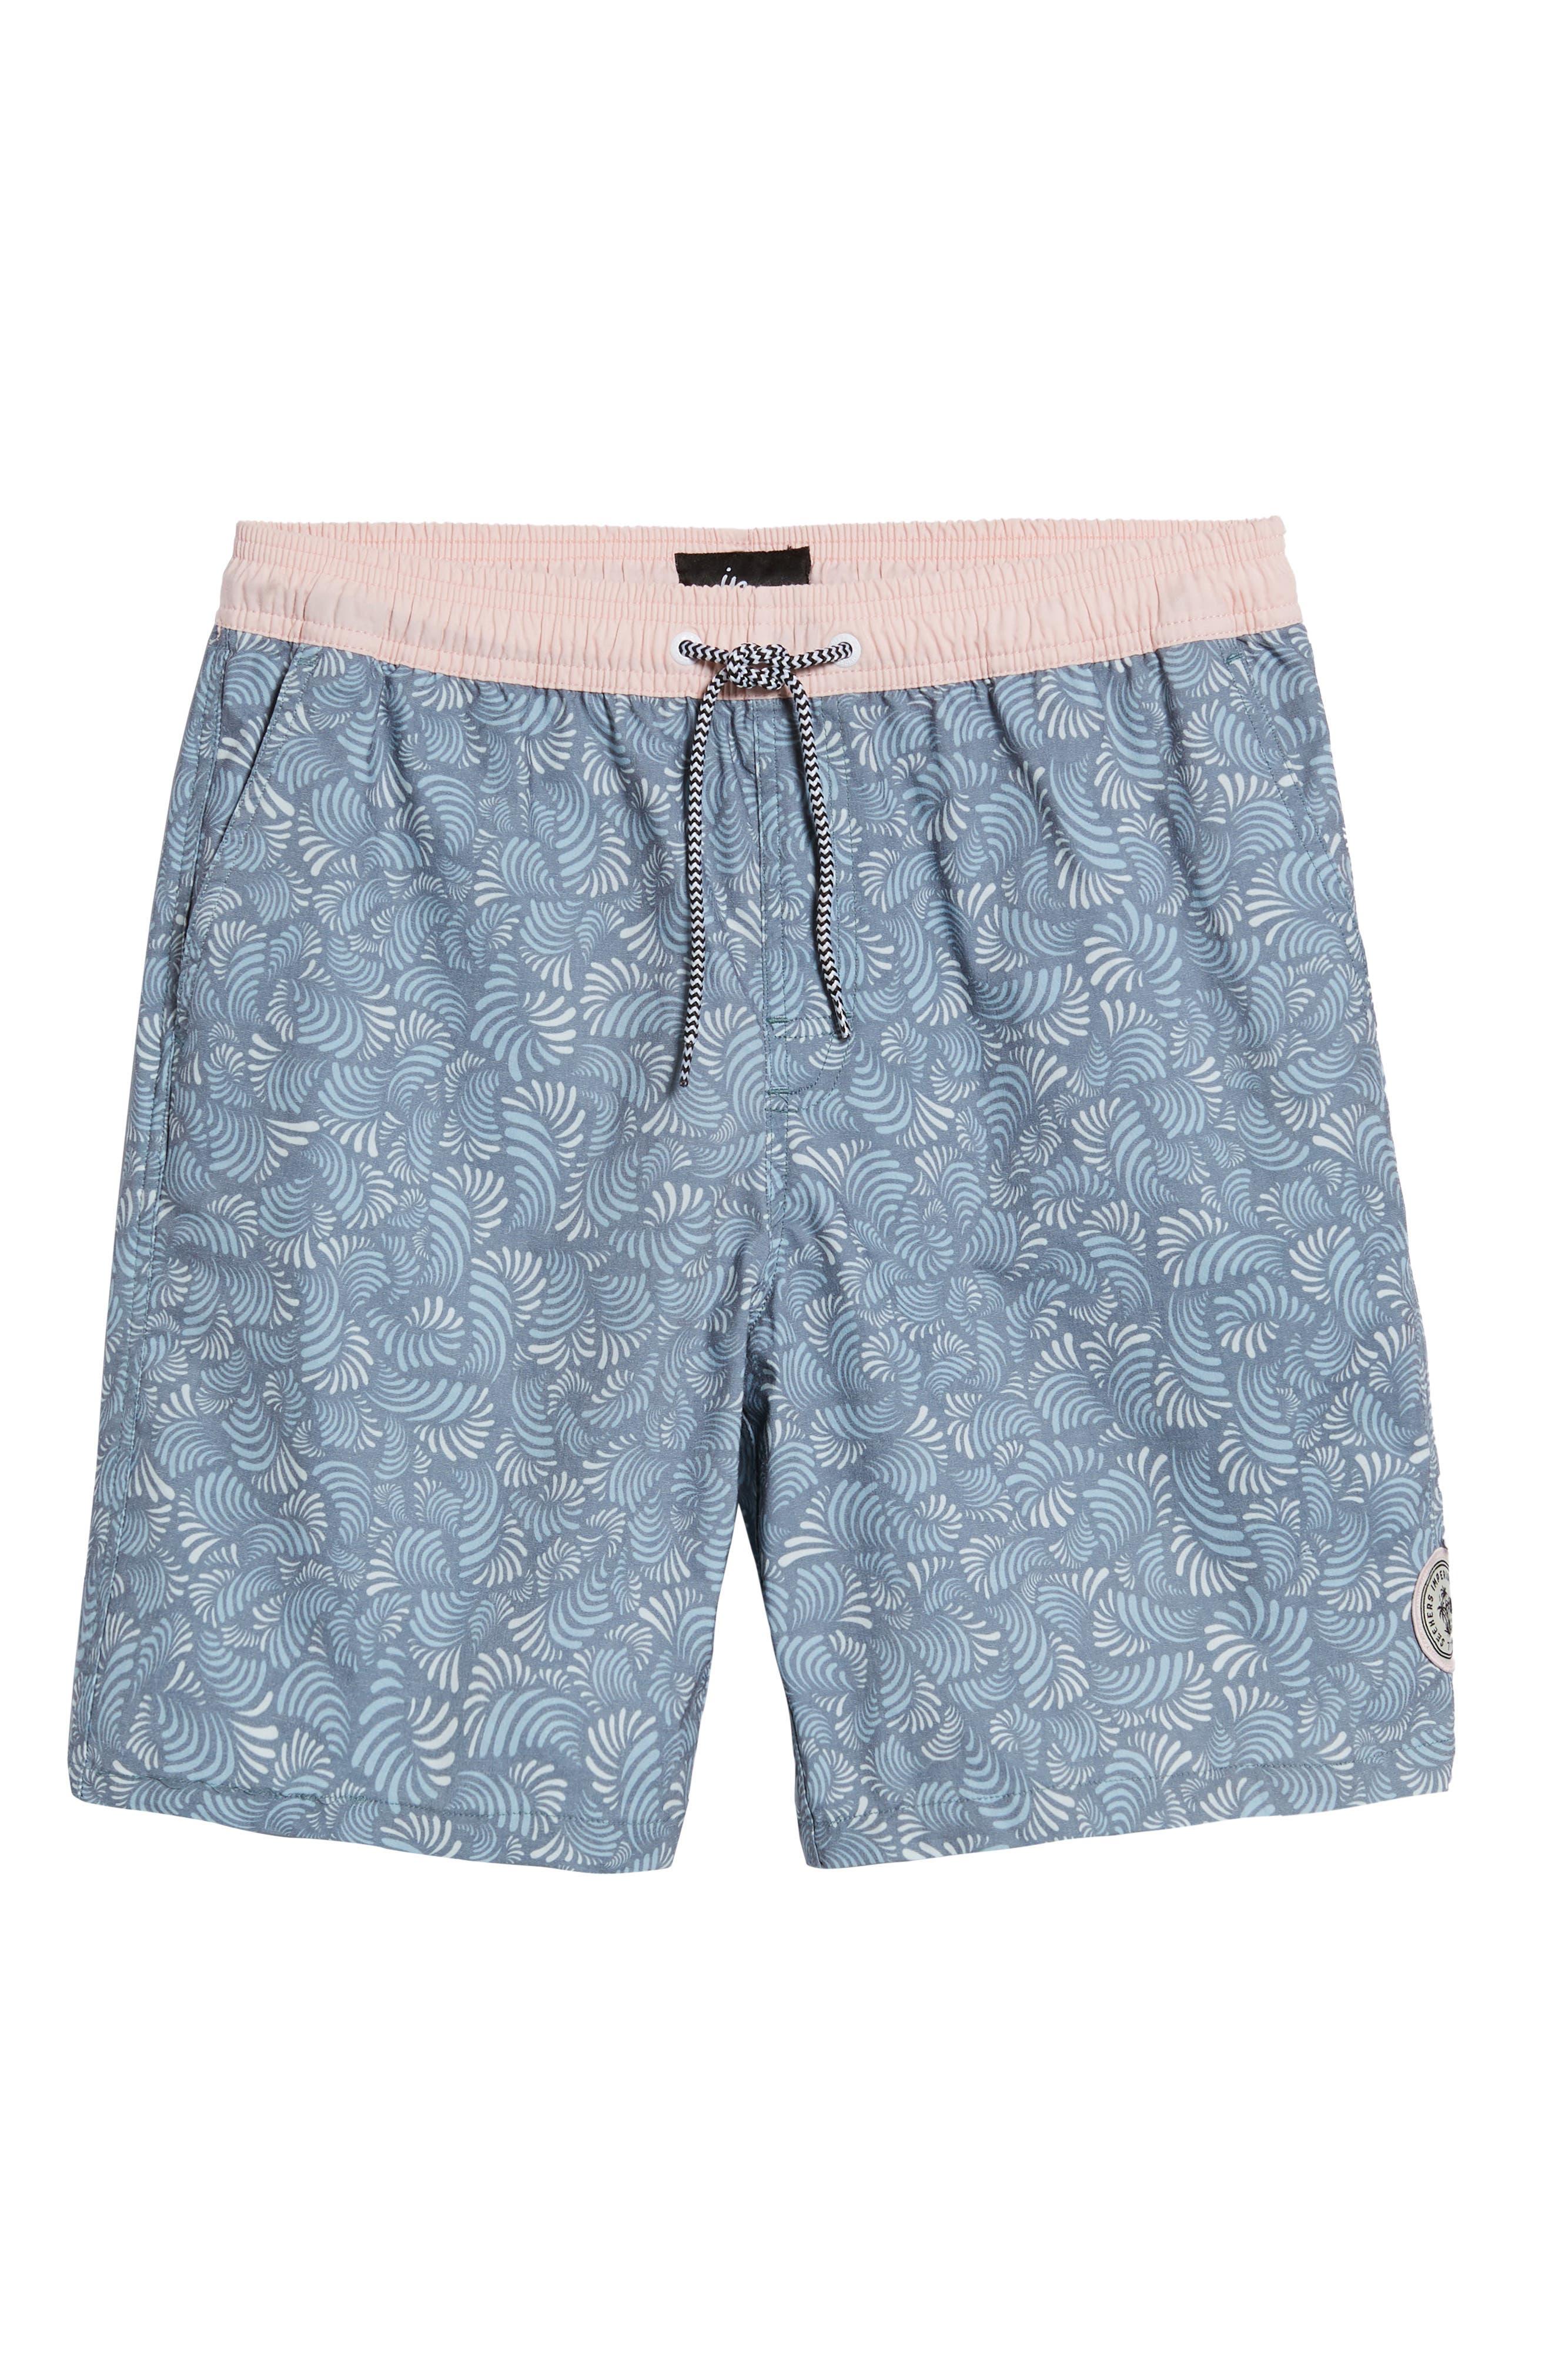 Hayworth Mix Board Shorts,                             Alternate thumbnail 6, color,